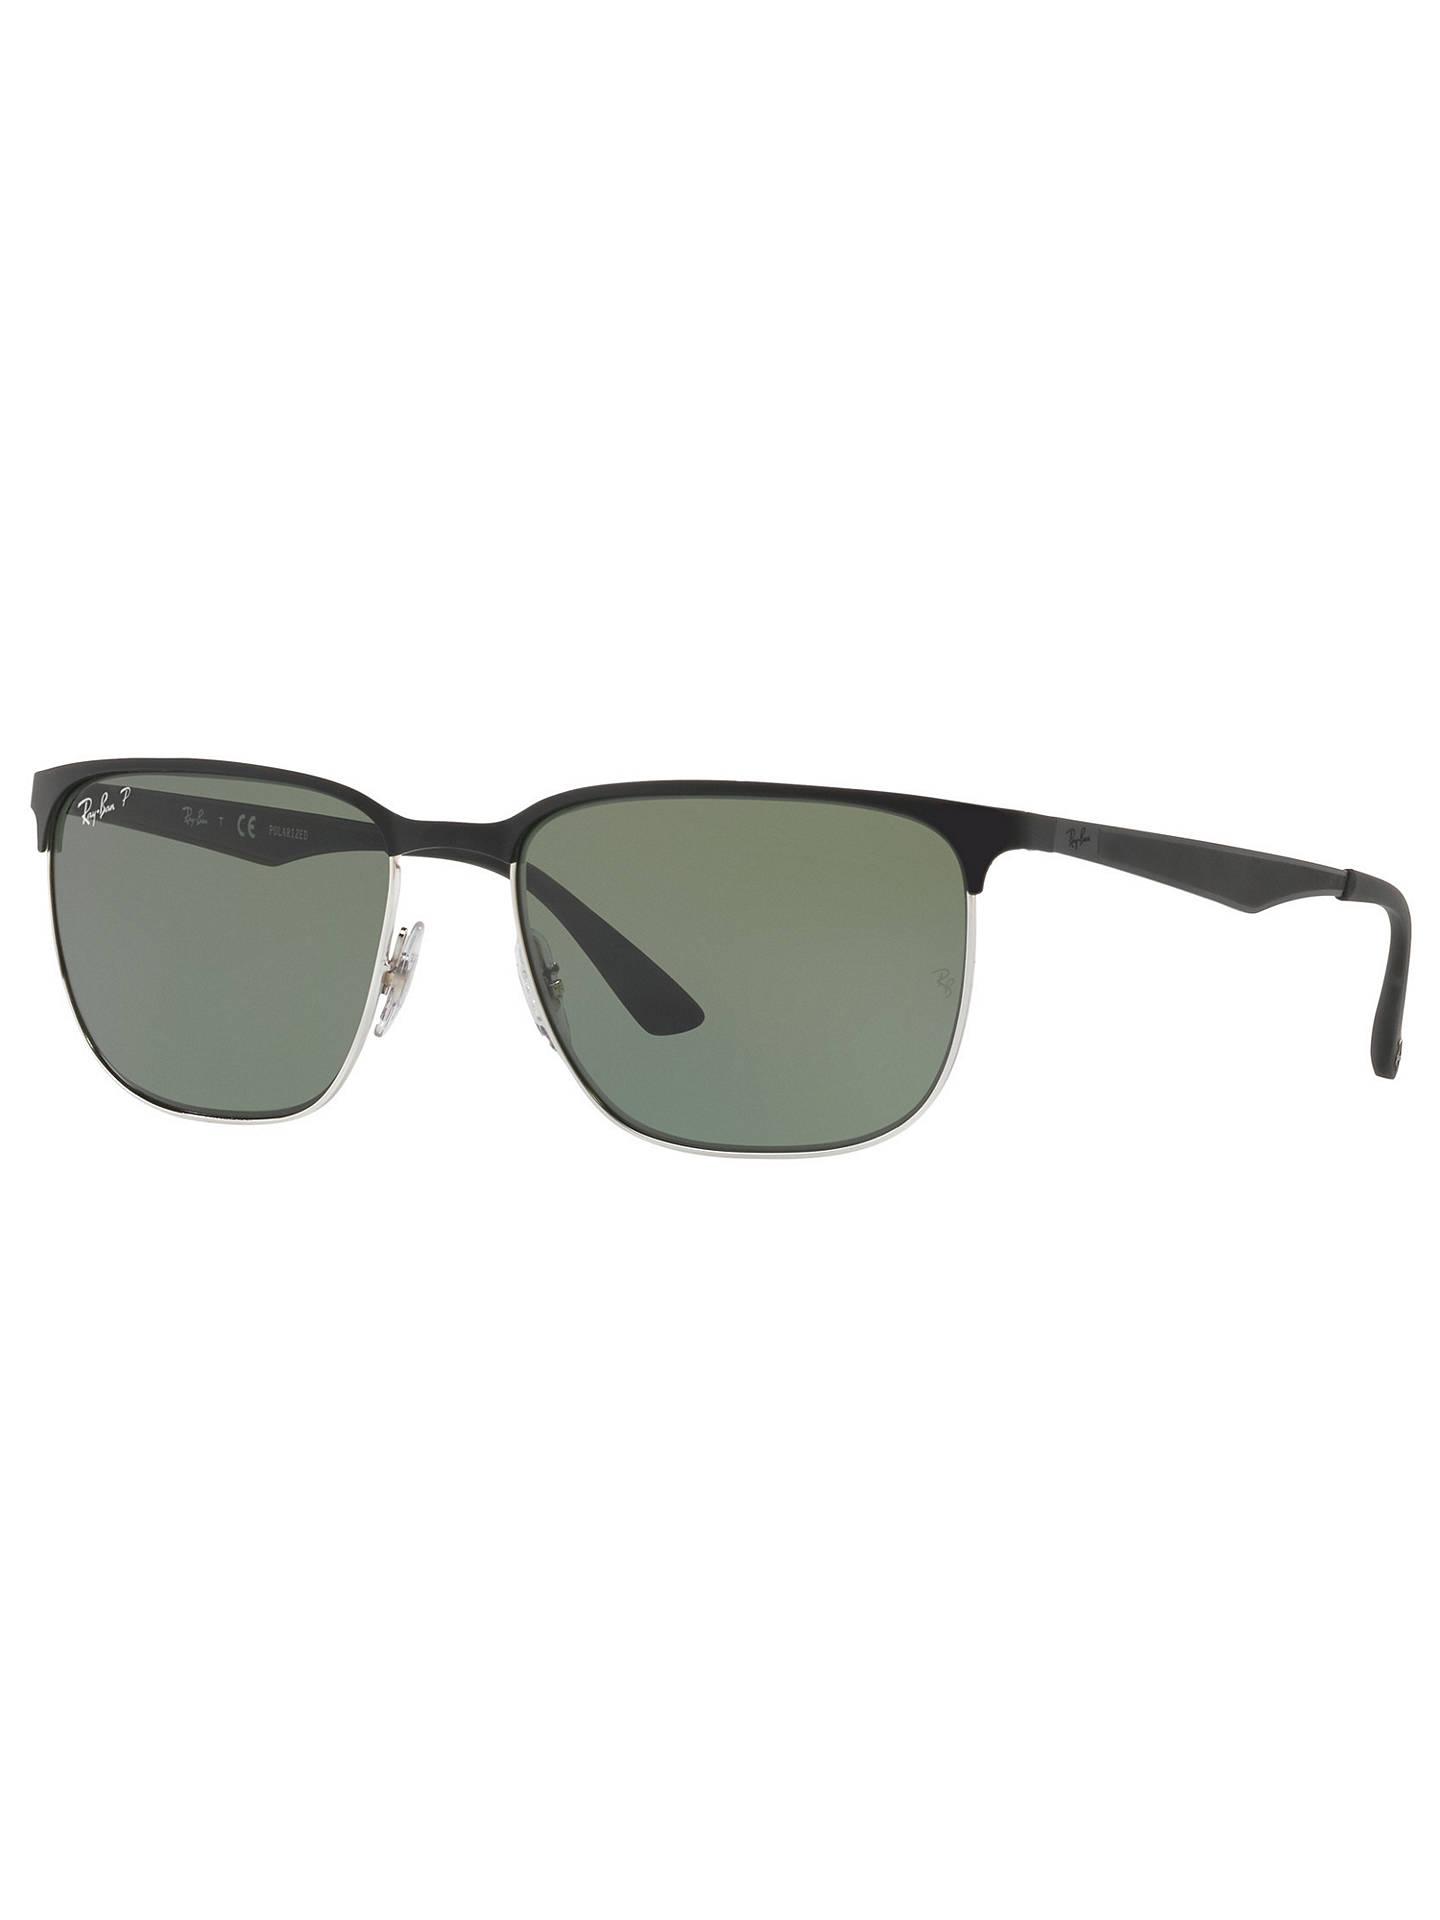 7394542549 BuyRay-Ban RB3569 Polarised Square Sunglasses